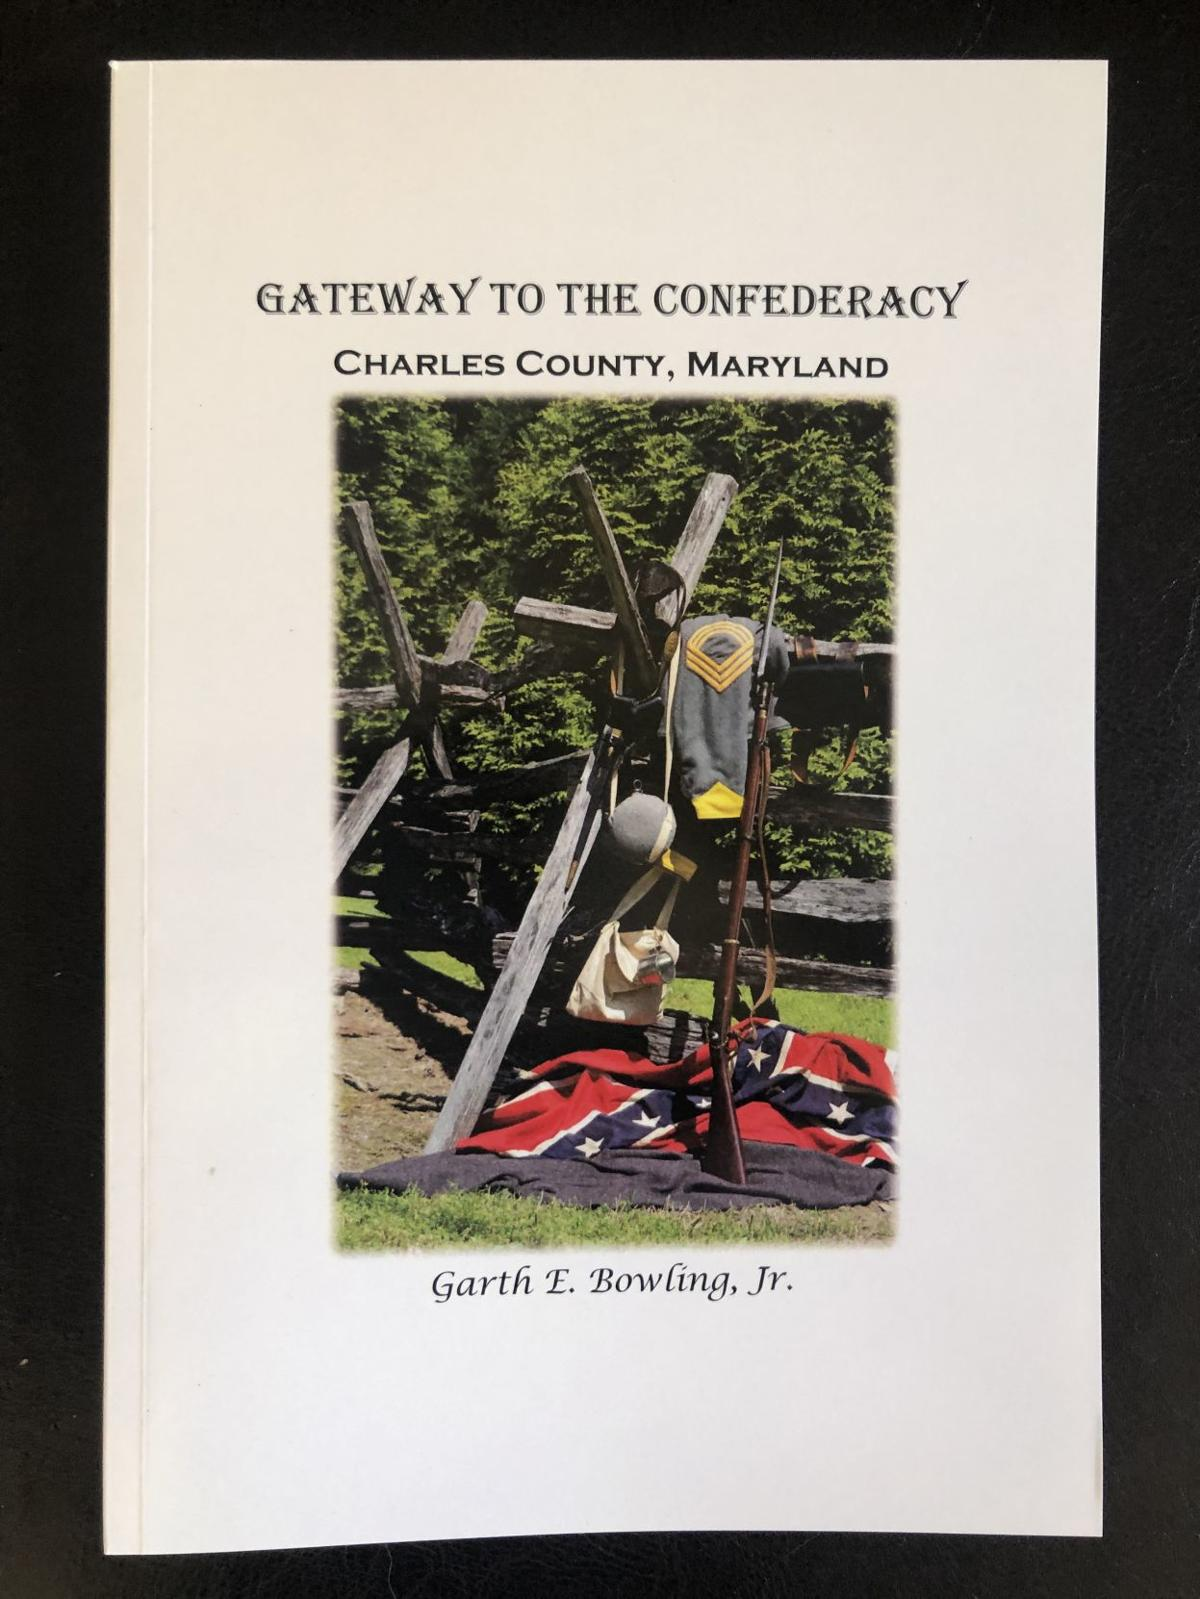 New book details local families' Civil War stories